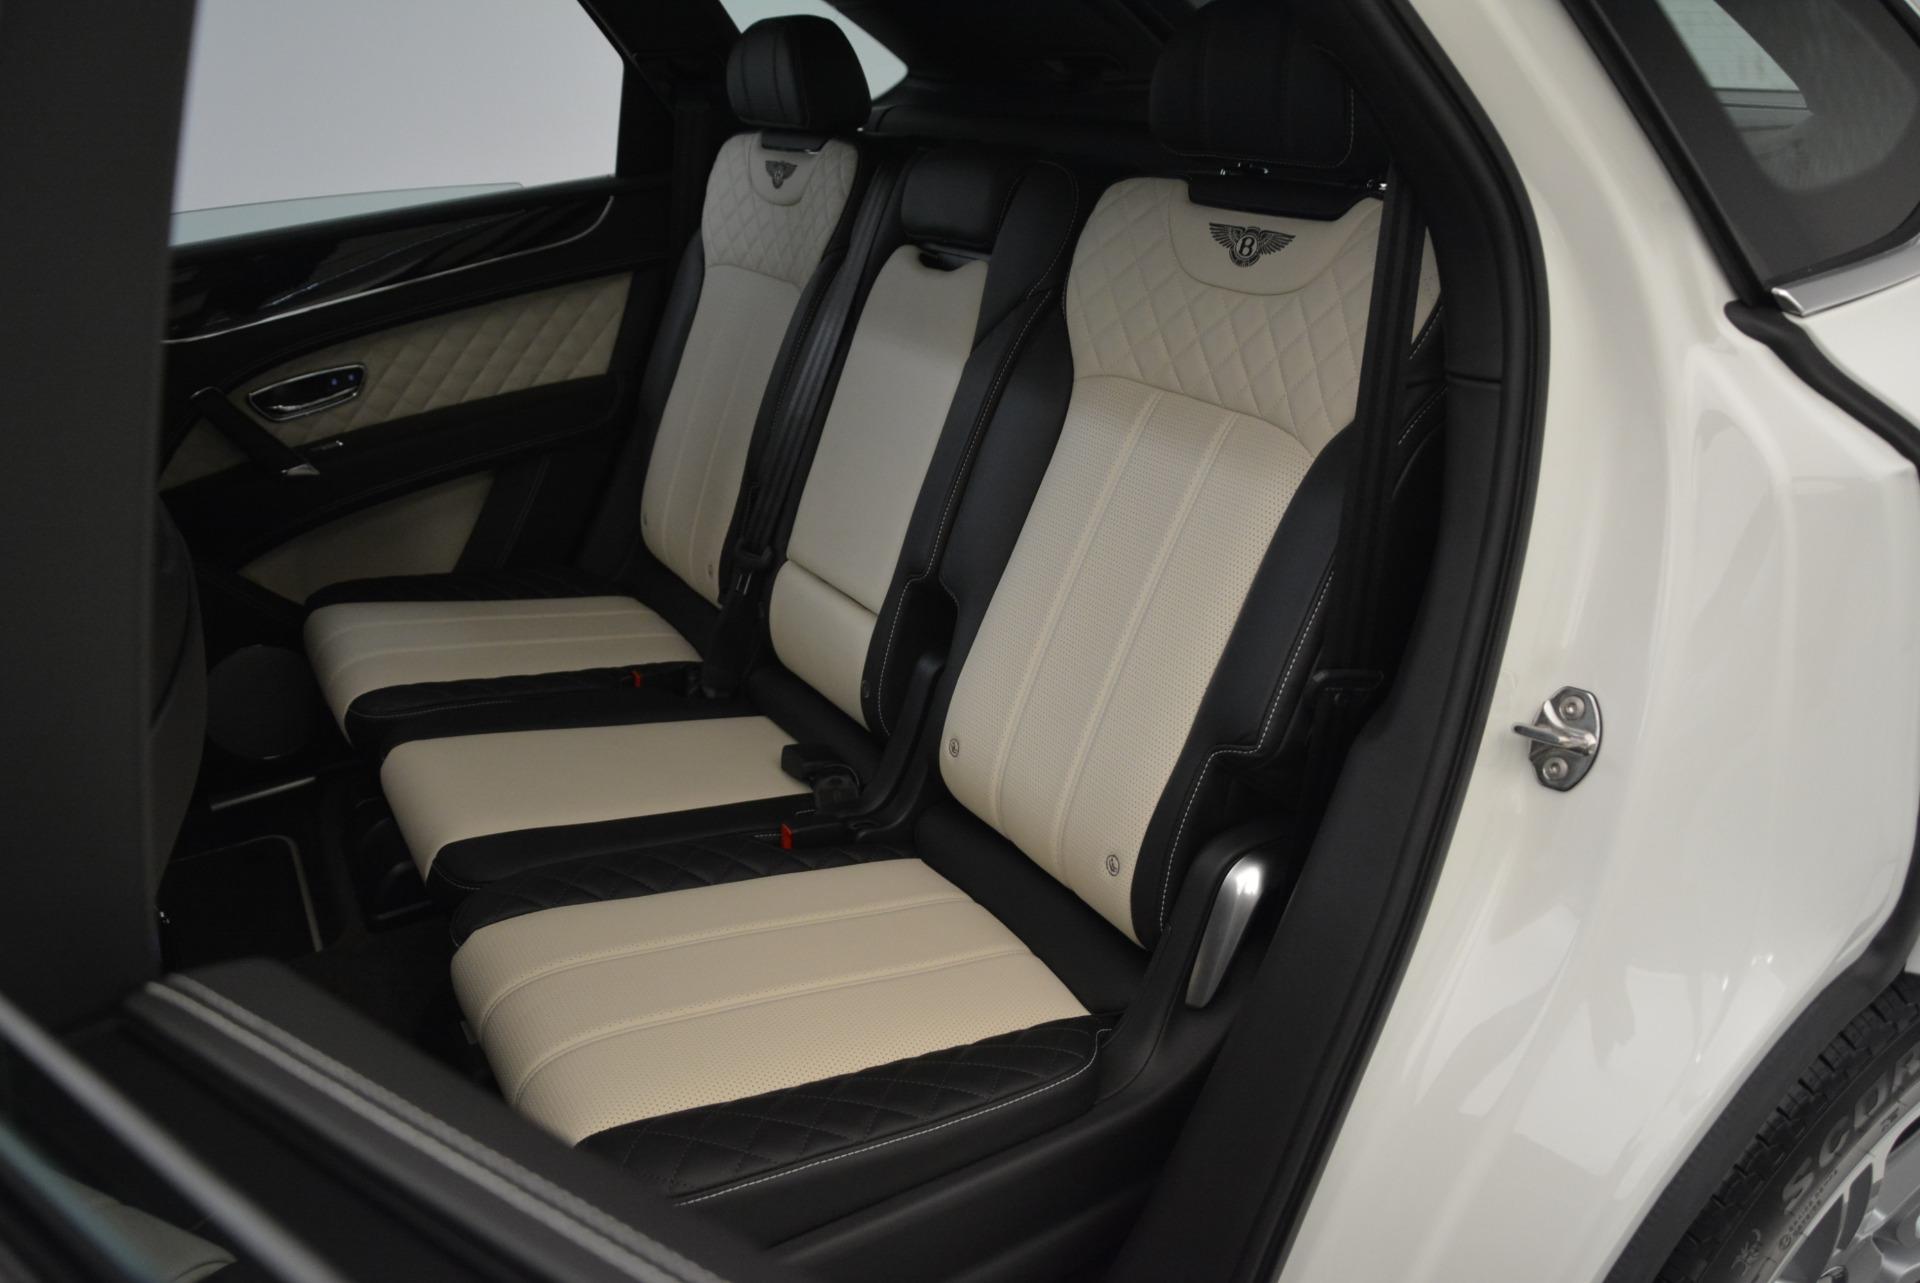 2018 Bentley Bentayga Activity Edition Stock B1316 for sale near